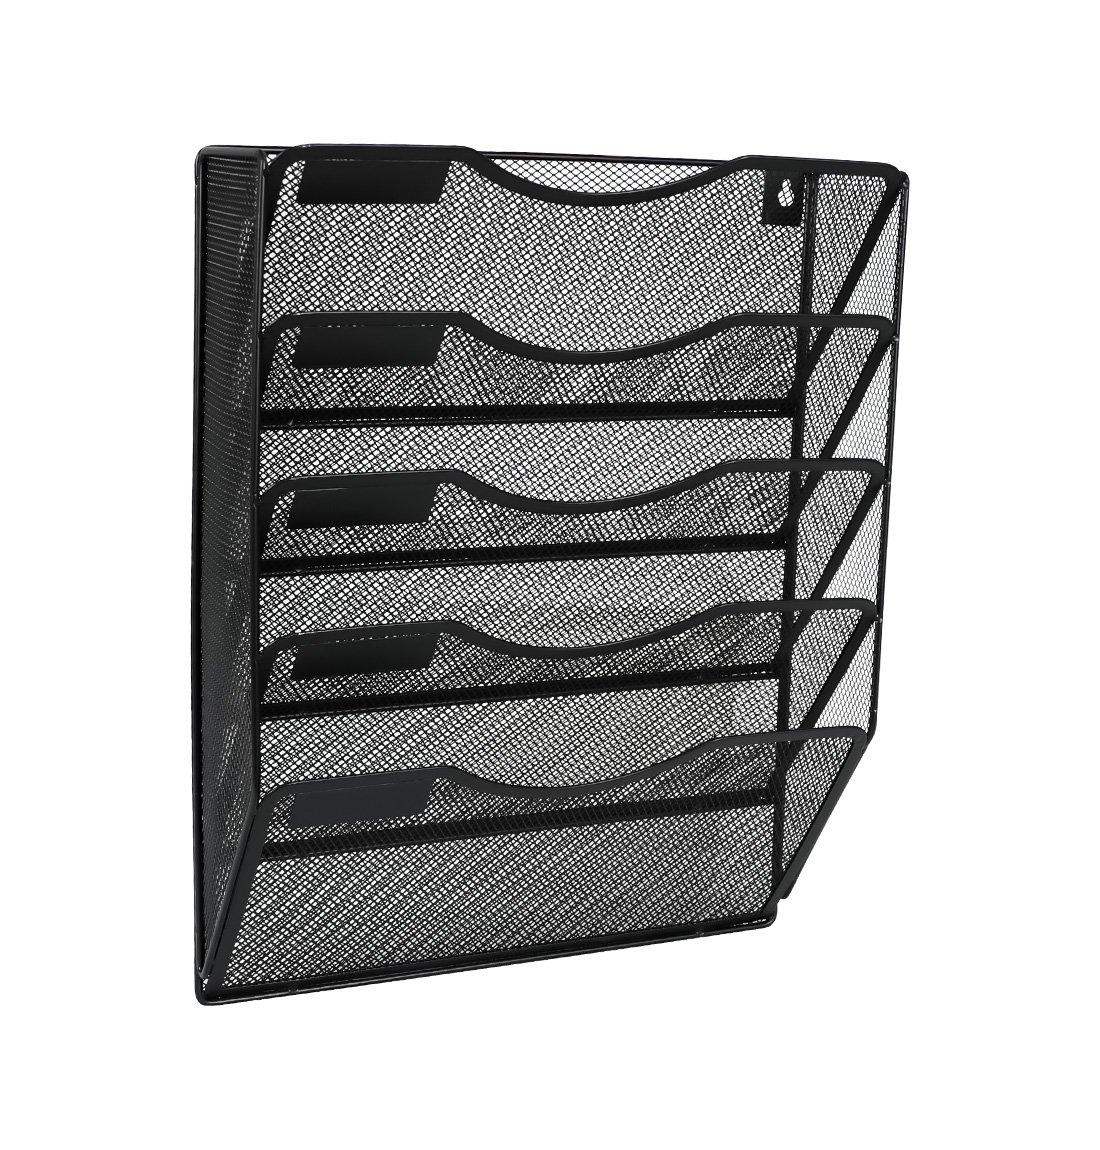 EasyPAG 5 Pockets Wall File Holder Organizer Hanging Magazine Rack,Black by EasyPAG